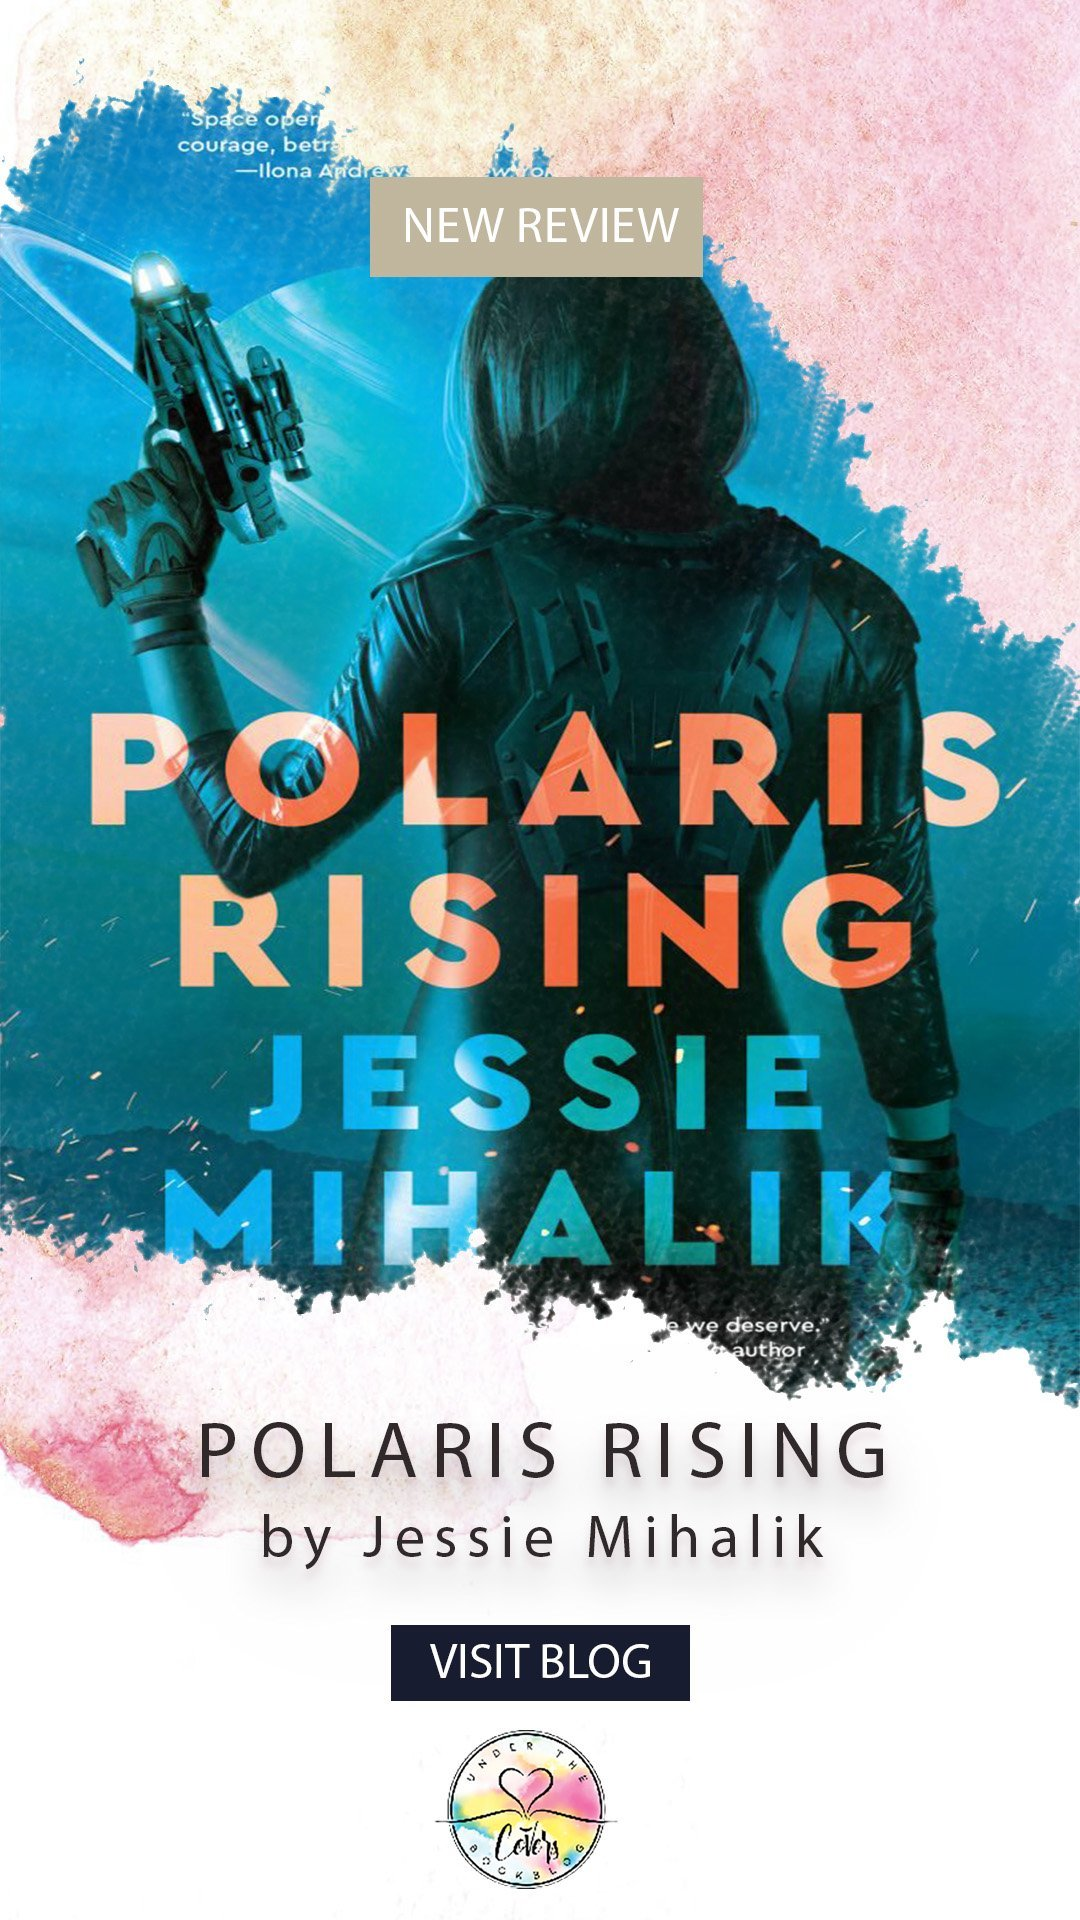 ARC Review: Polaris Rising by Jessie Mihalik